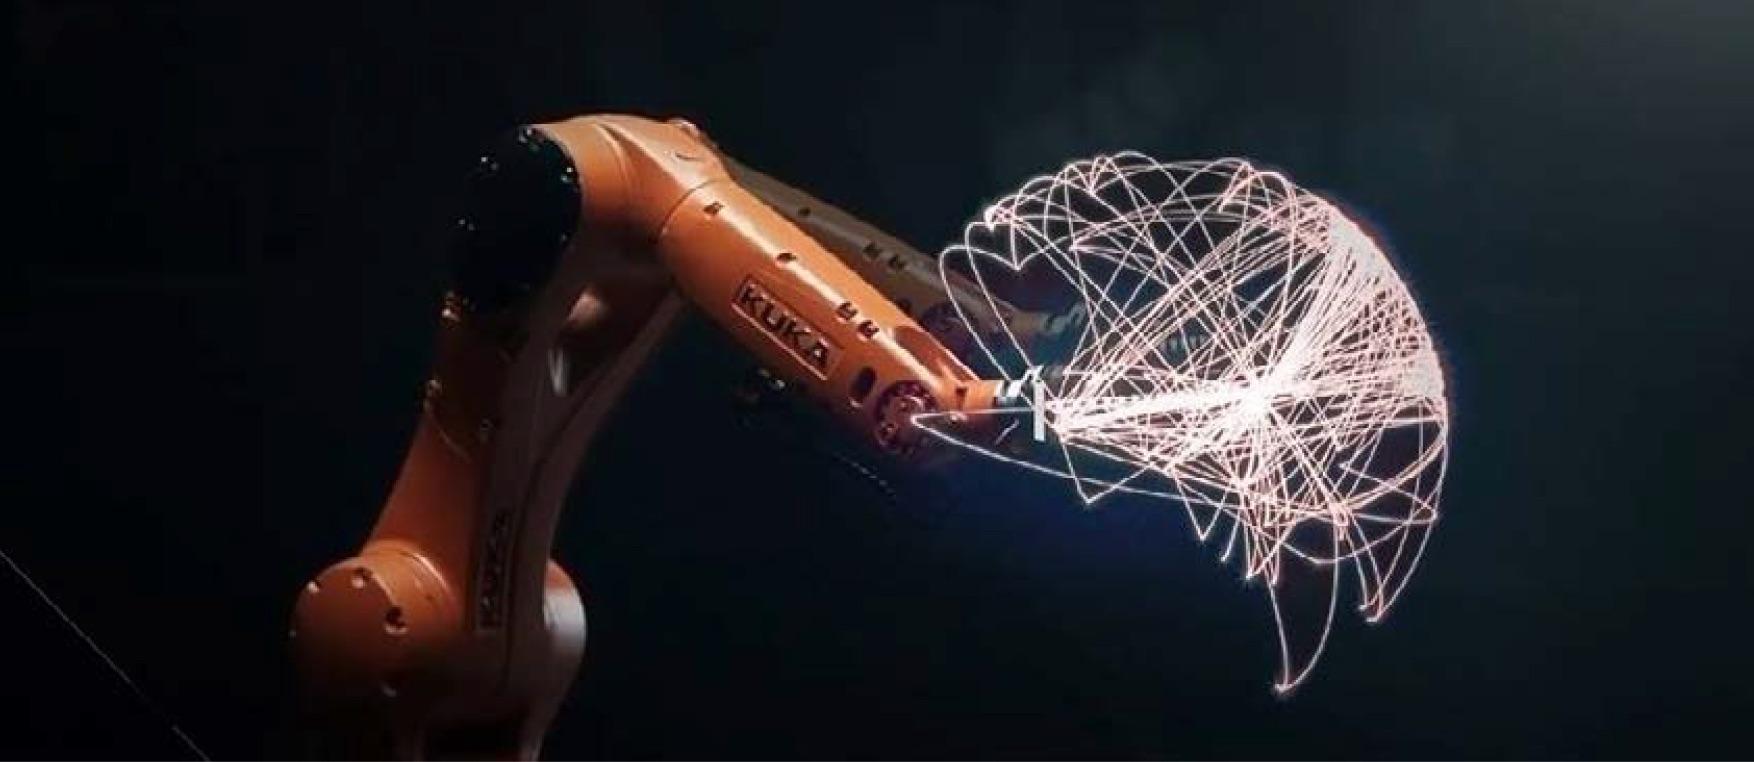 3_Arte Robotica_DesignMorphine_Inspirationist